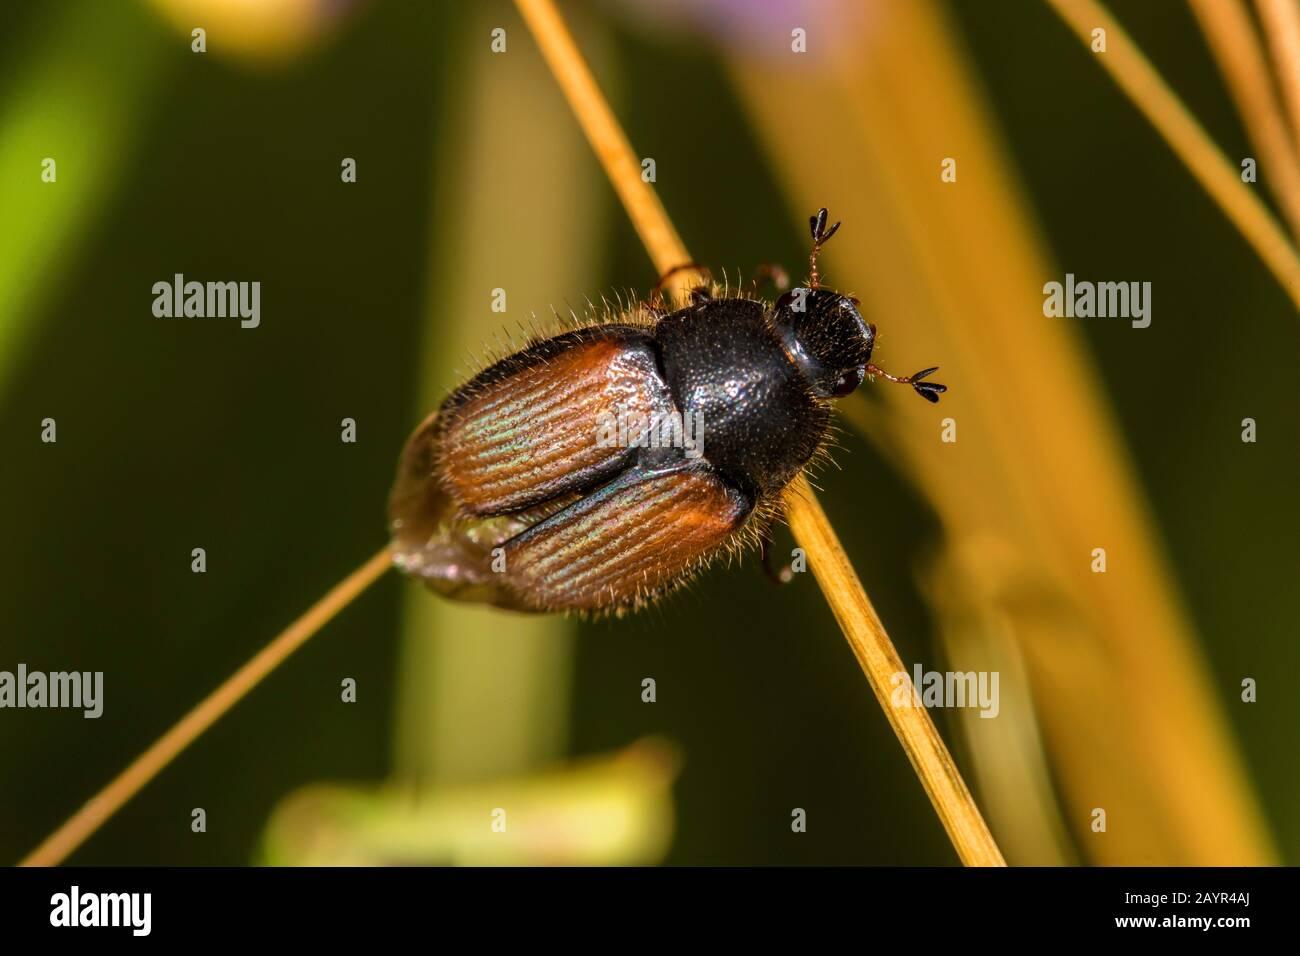 scarab beetle (Omaloplia nigromarginata), critically endangered species, Germany Stock Photo